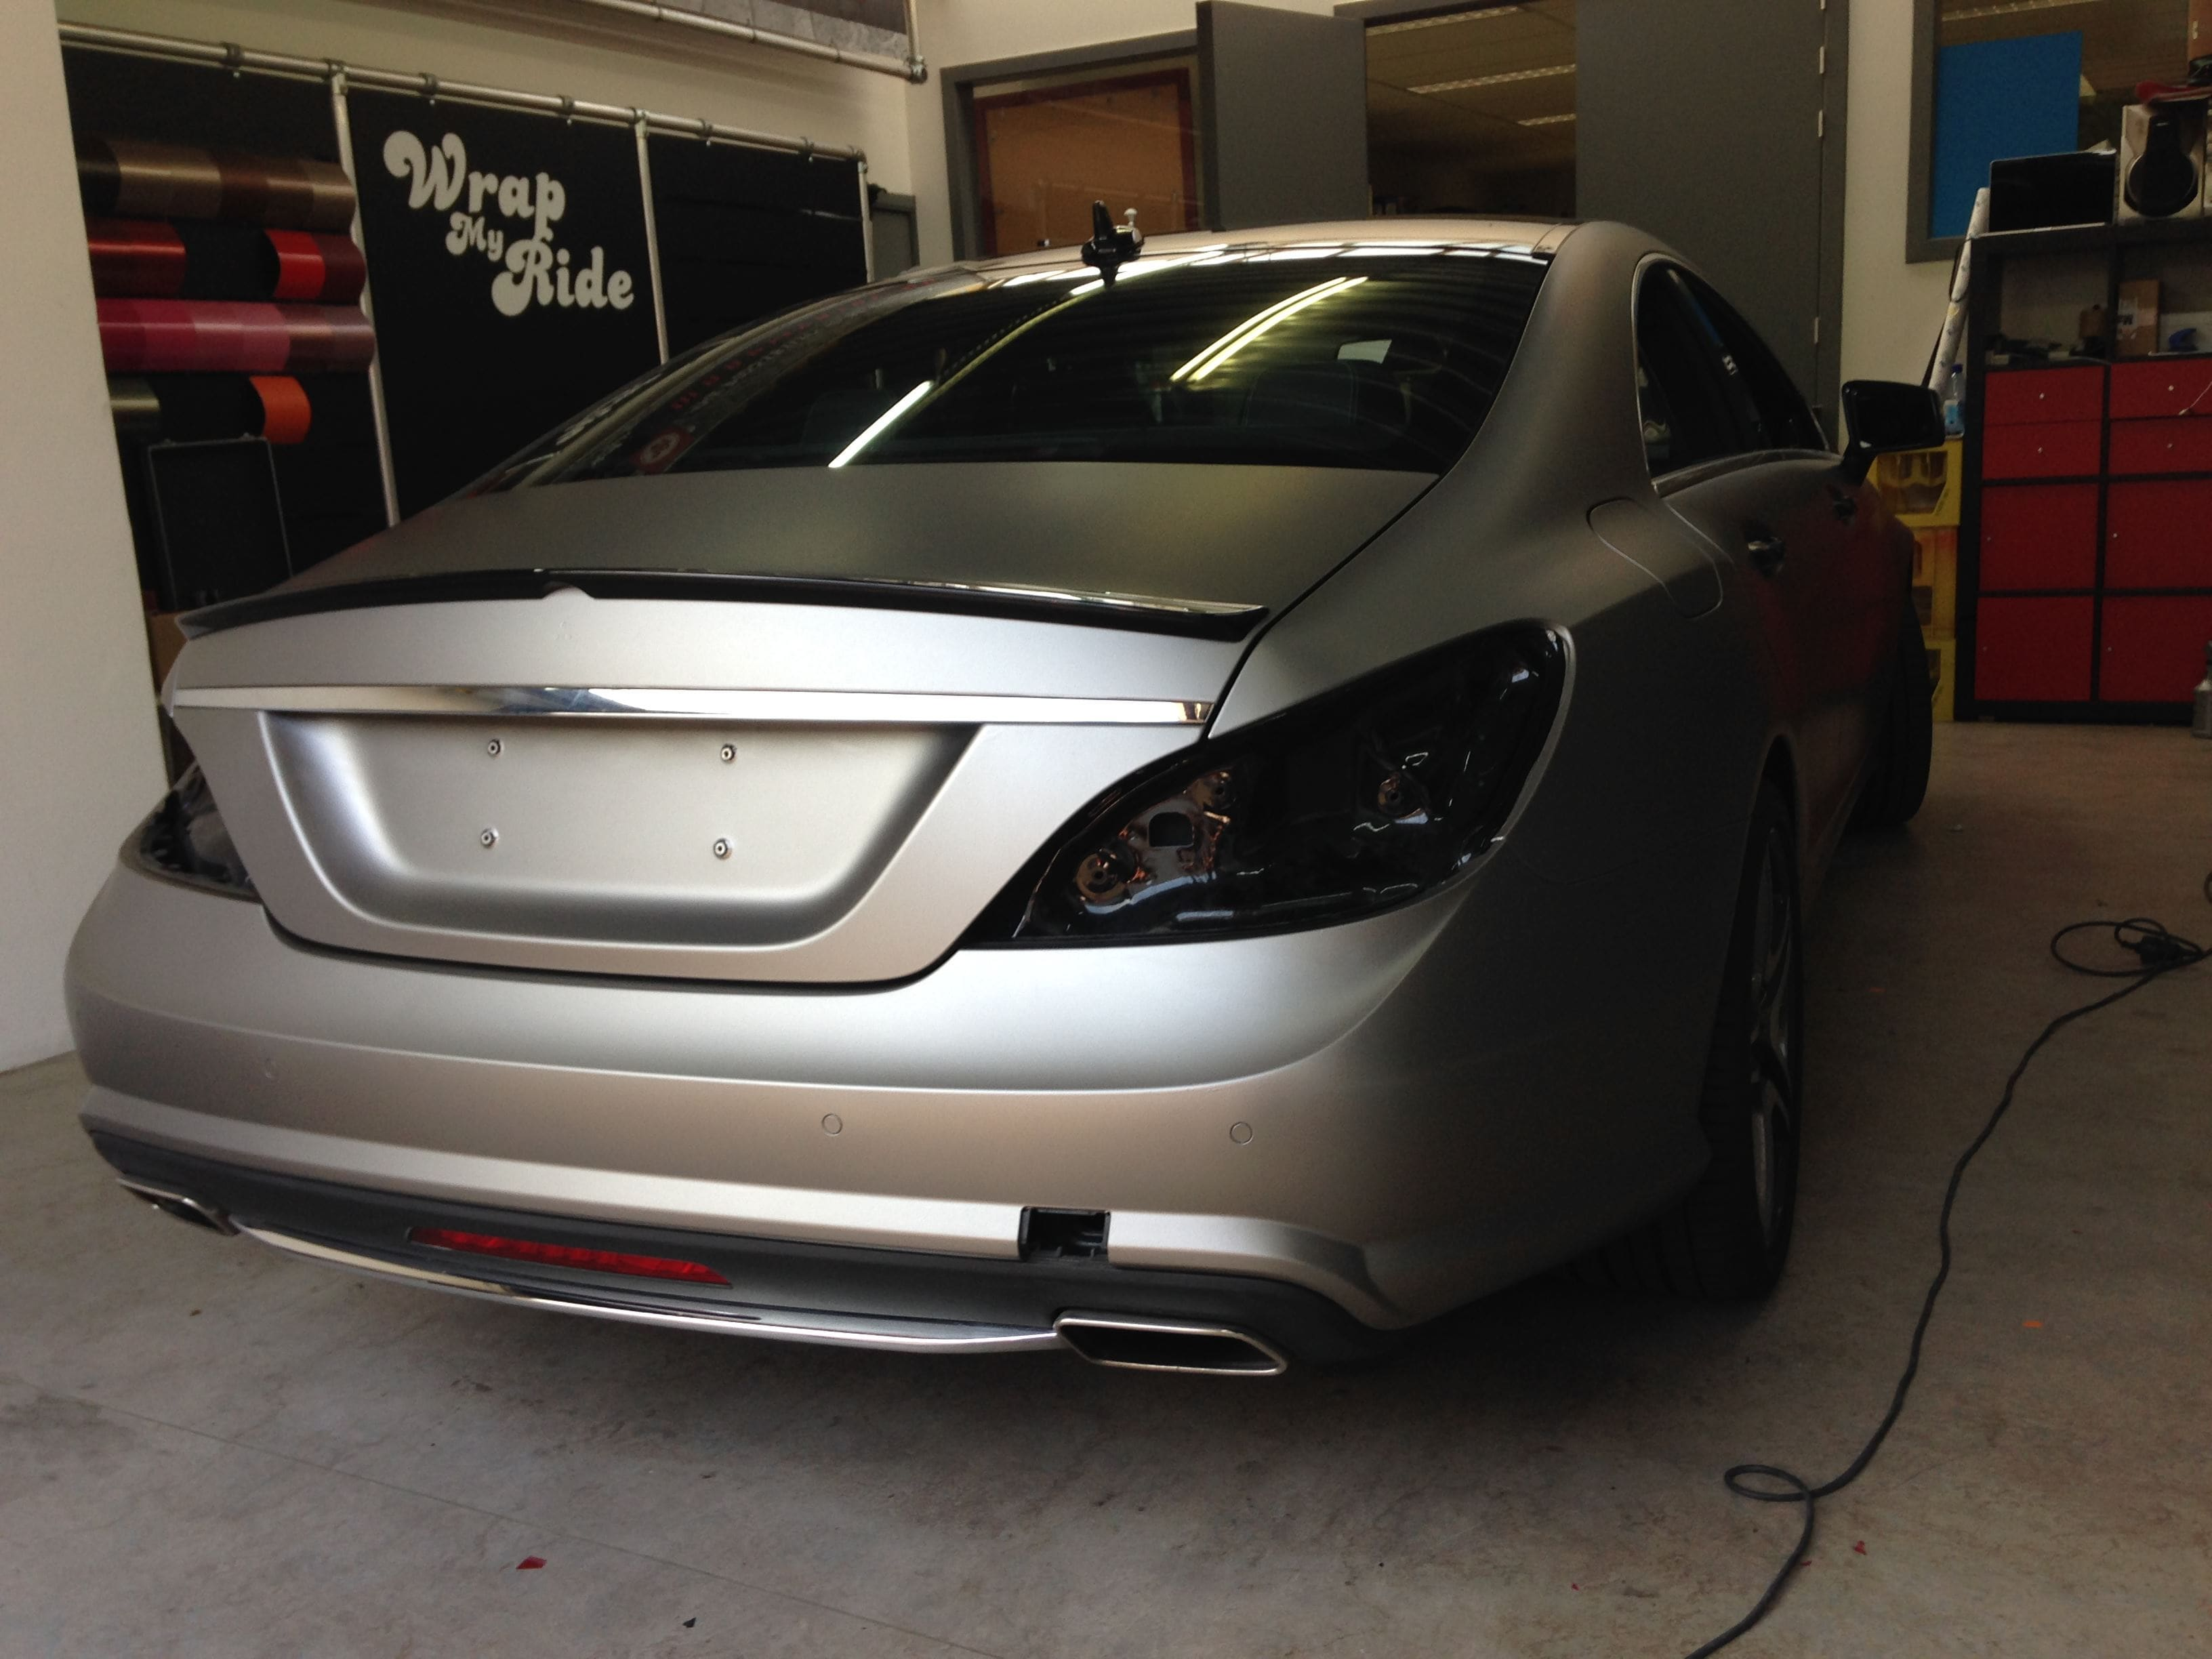 Mercedes CLS met Mat Grey Aluminium Wrap, Carwrapping door Wrapmyride.nu Foto-nr:6135, ©2020